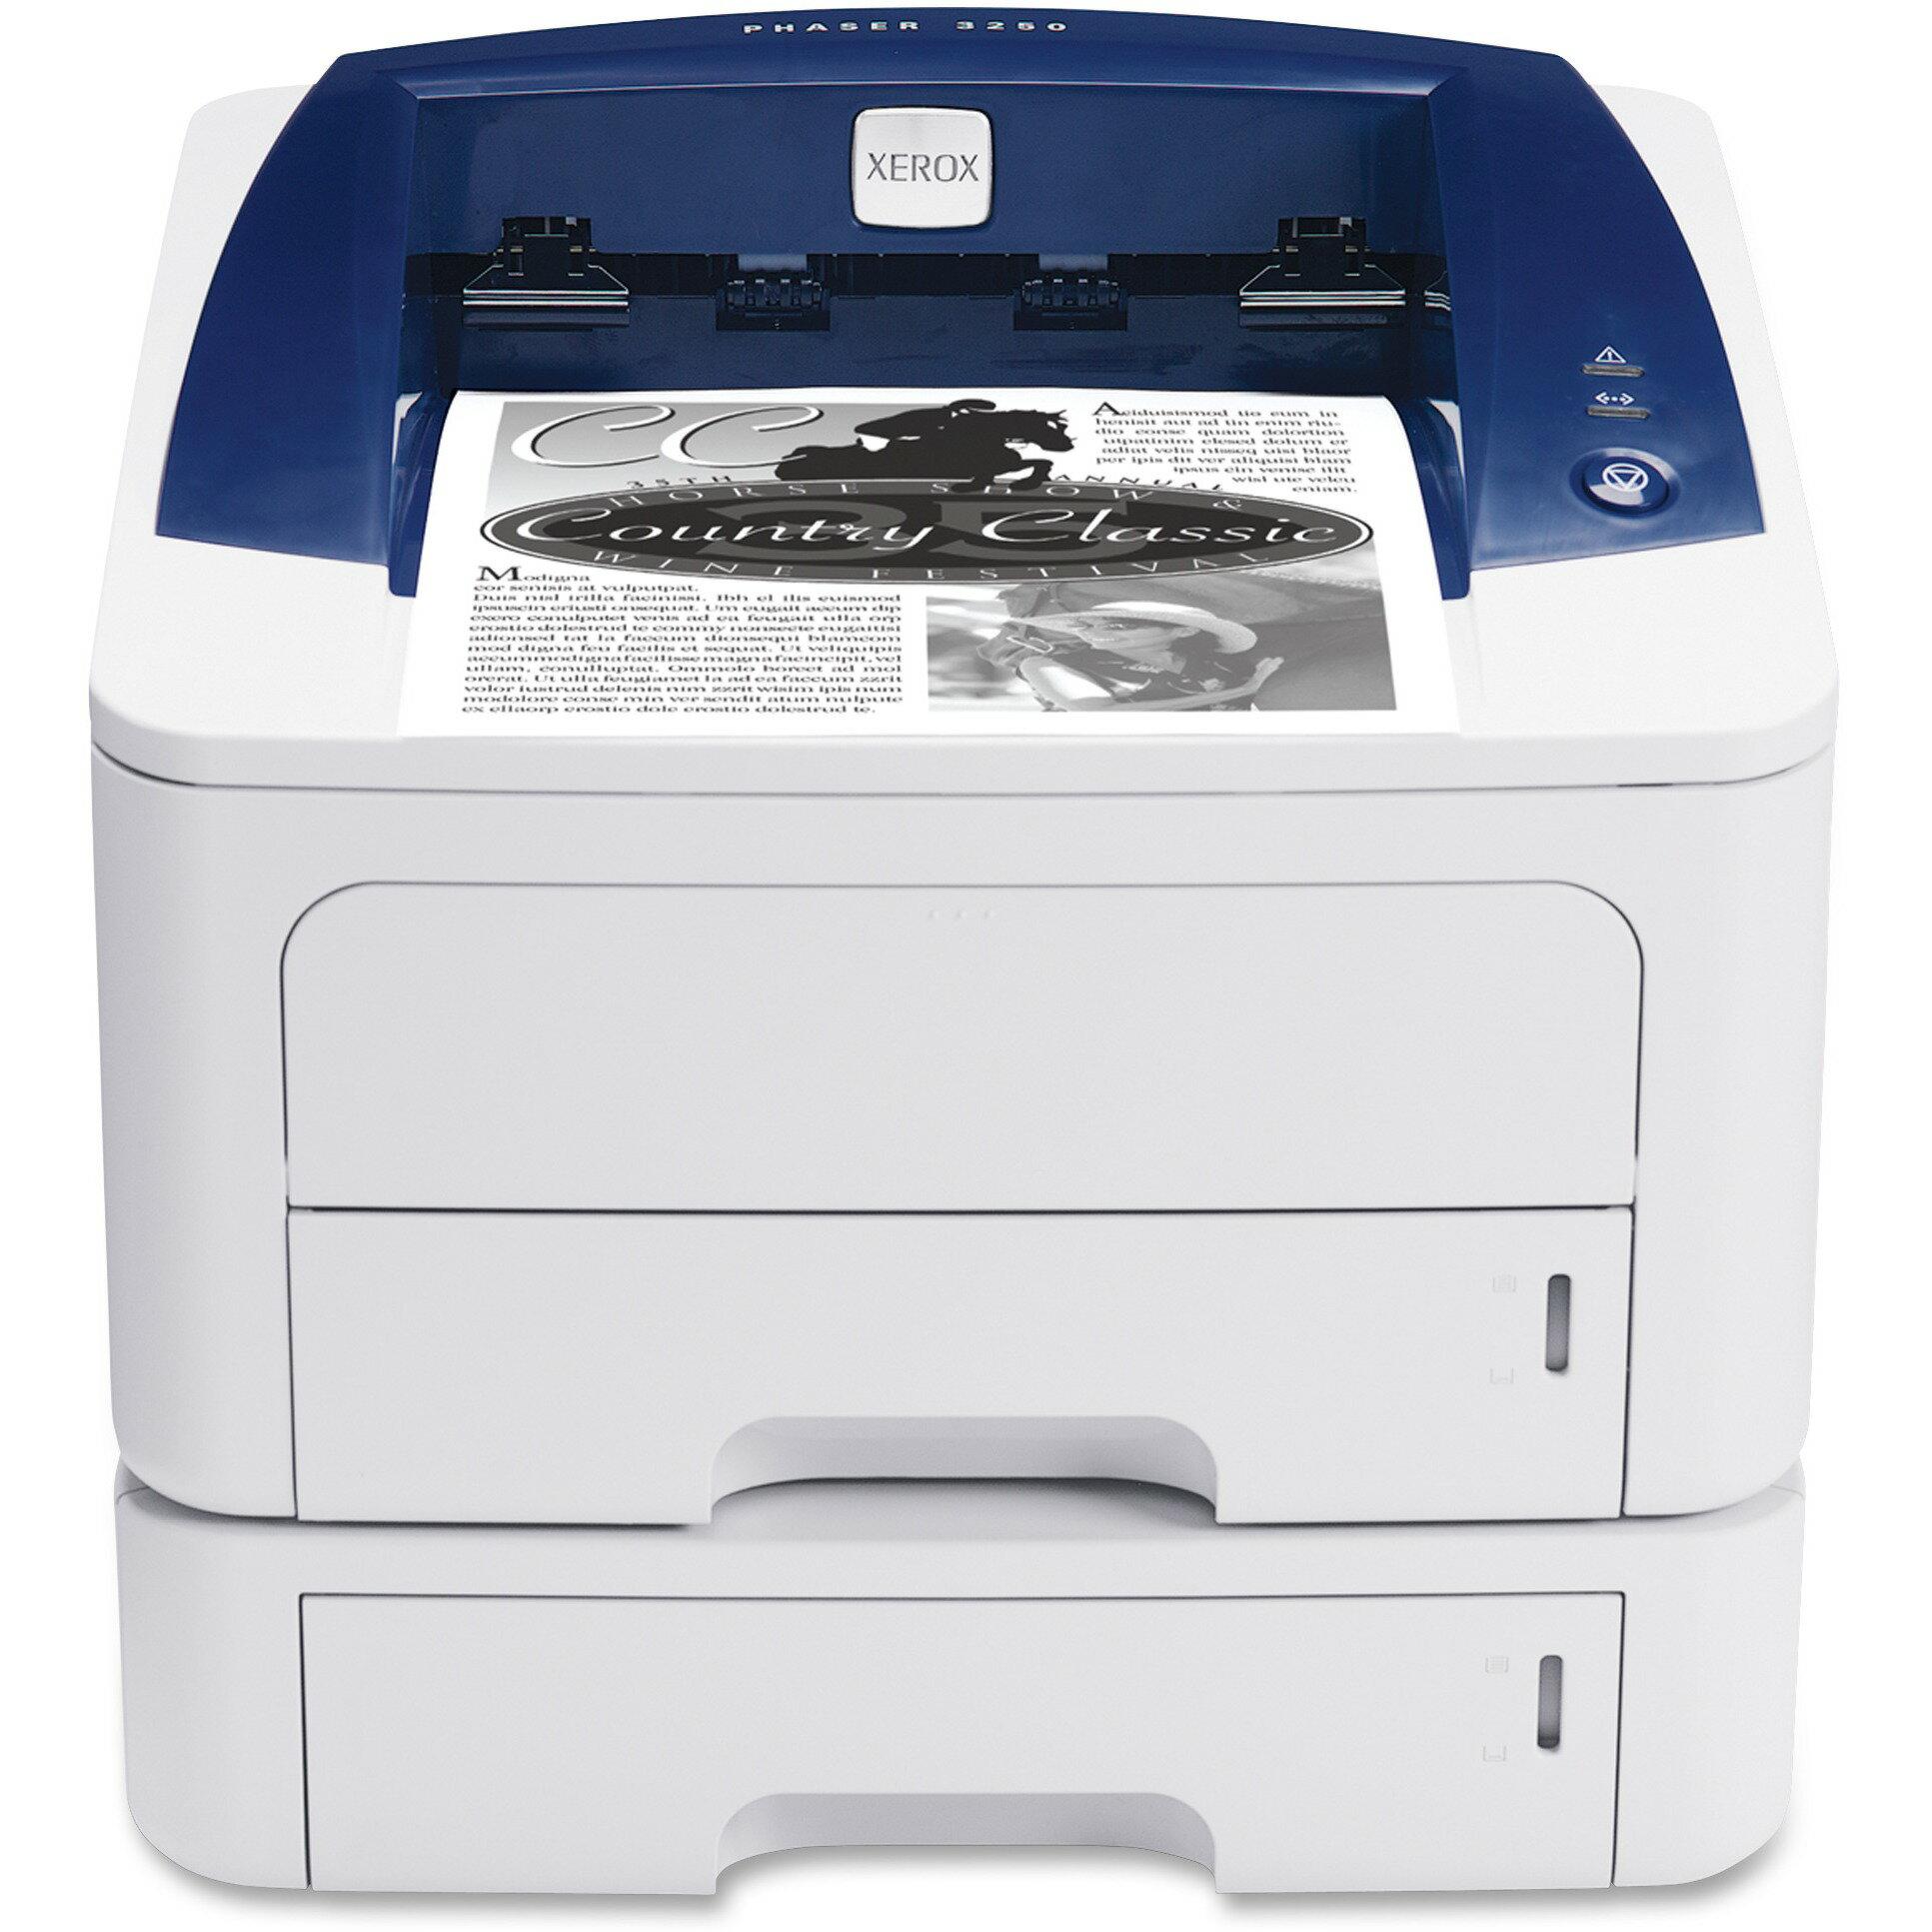 Xerox Phaser 3250DN Laser Printer - Monochrome - 30 ppm Mono - 1200 dpi - USB, Network - Fast Ethernet - PC, Mac 1